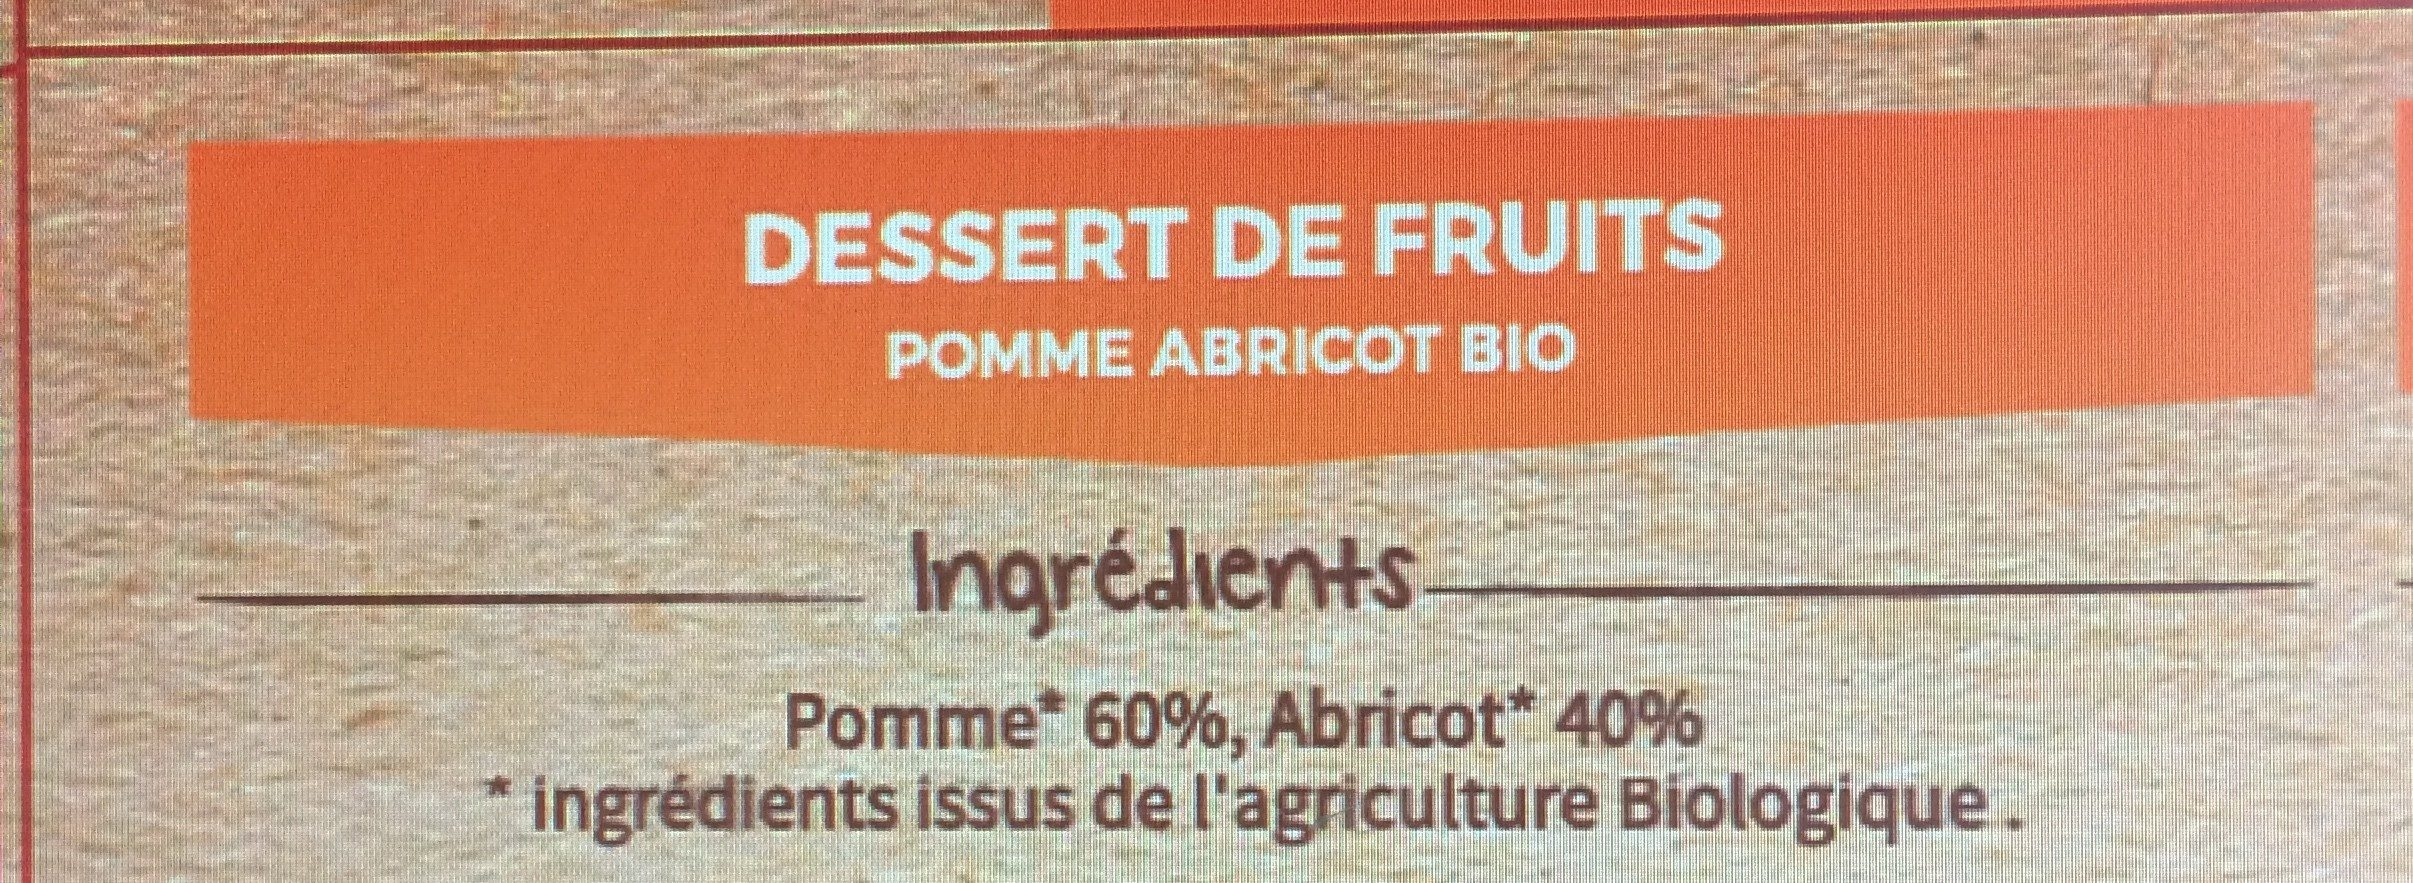 Dessert de fruits pomme abricot bio - Ingredients